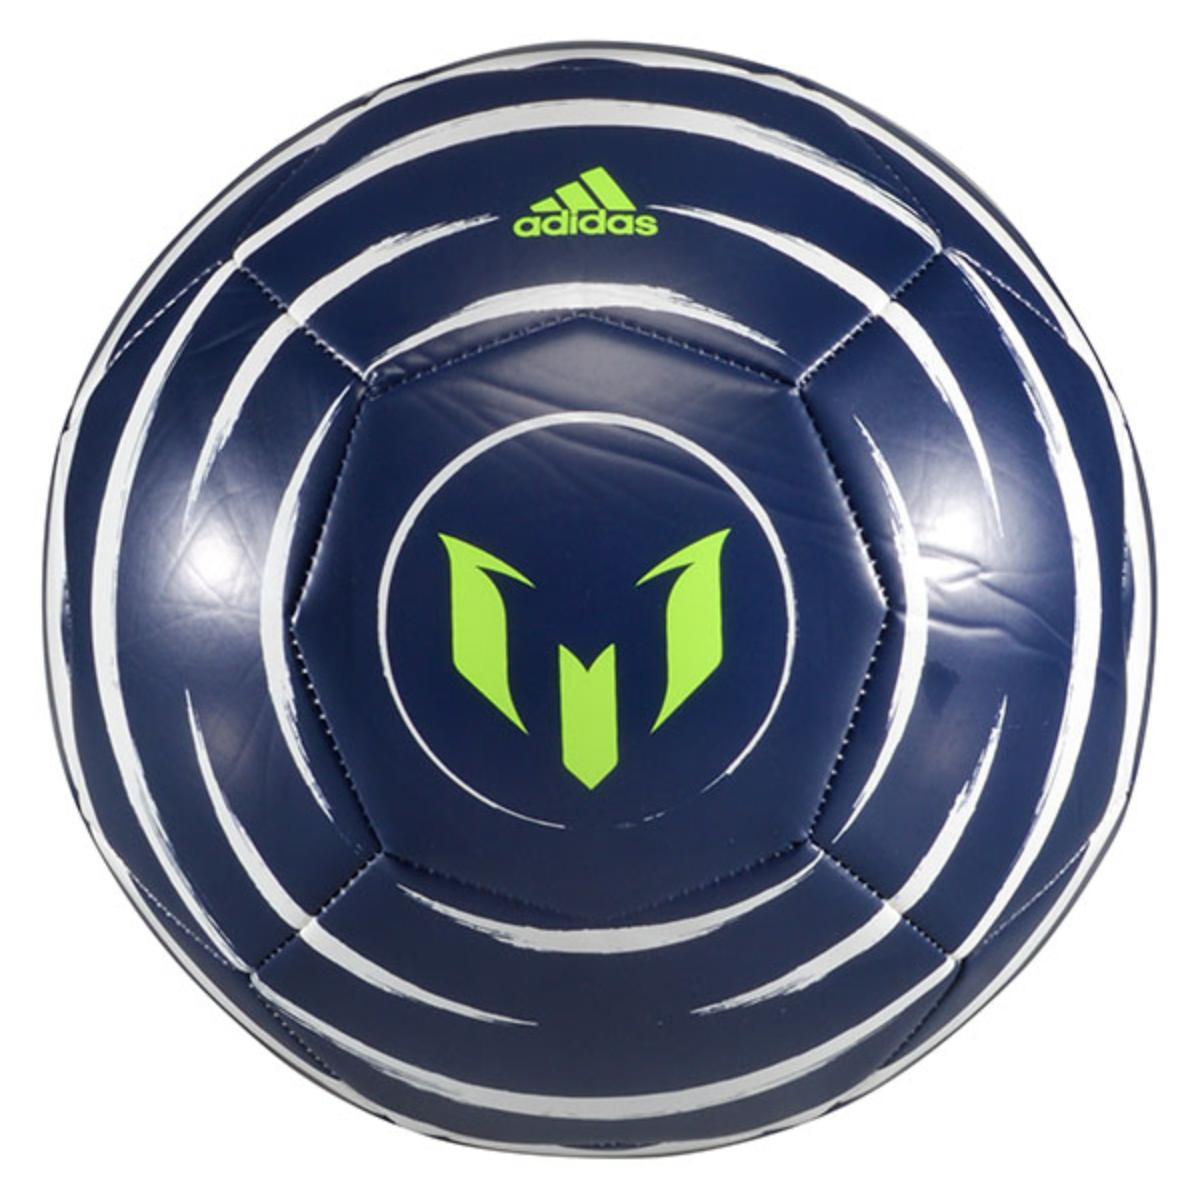 Bola Unisex Adidas Fl7026 Messi Clb Marinho/branco